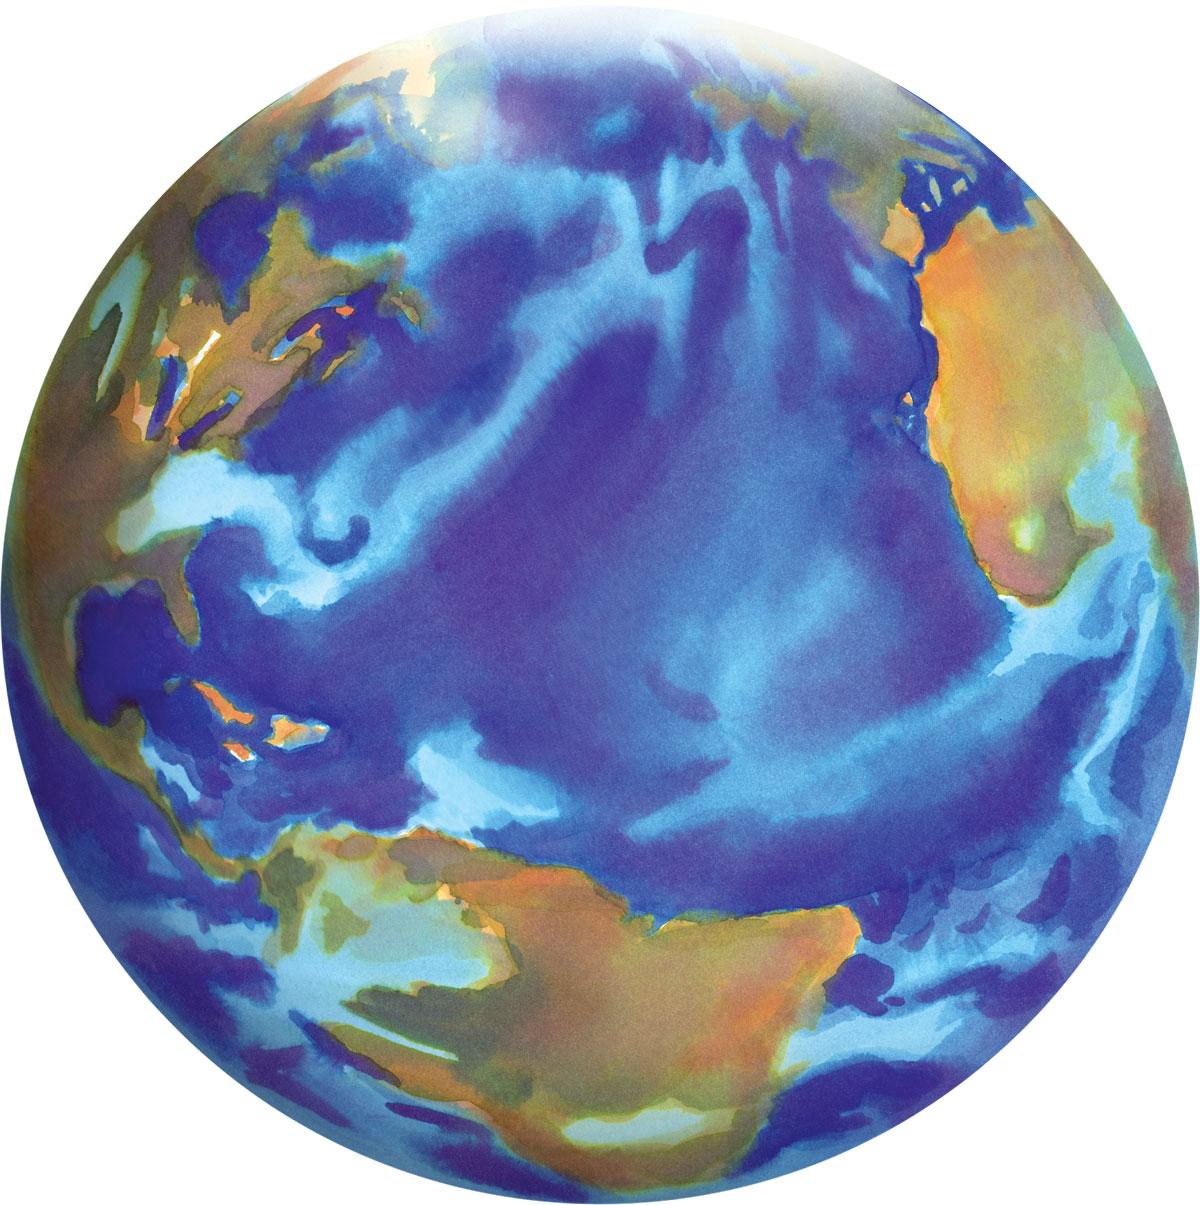 <p>Earth</p>